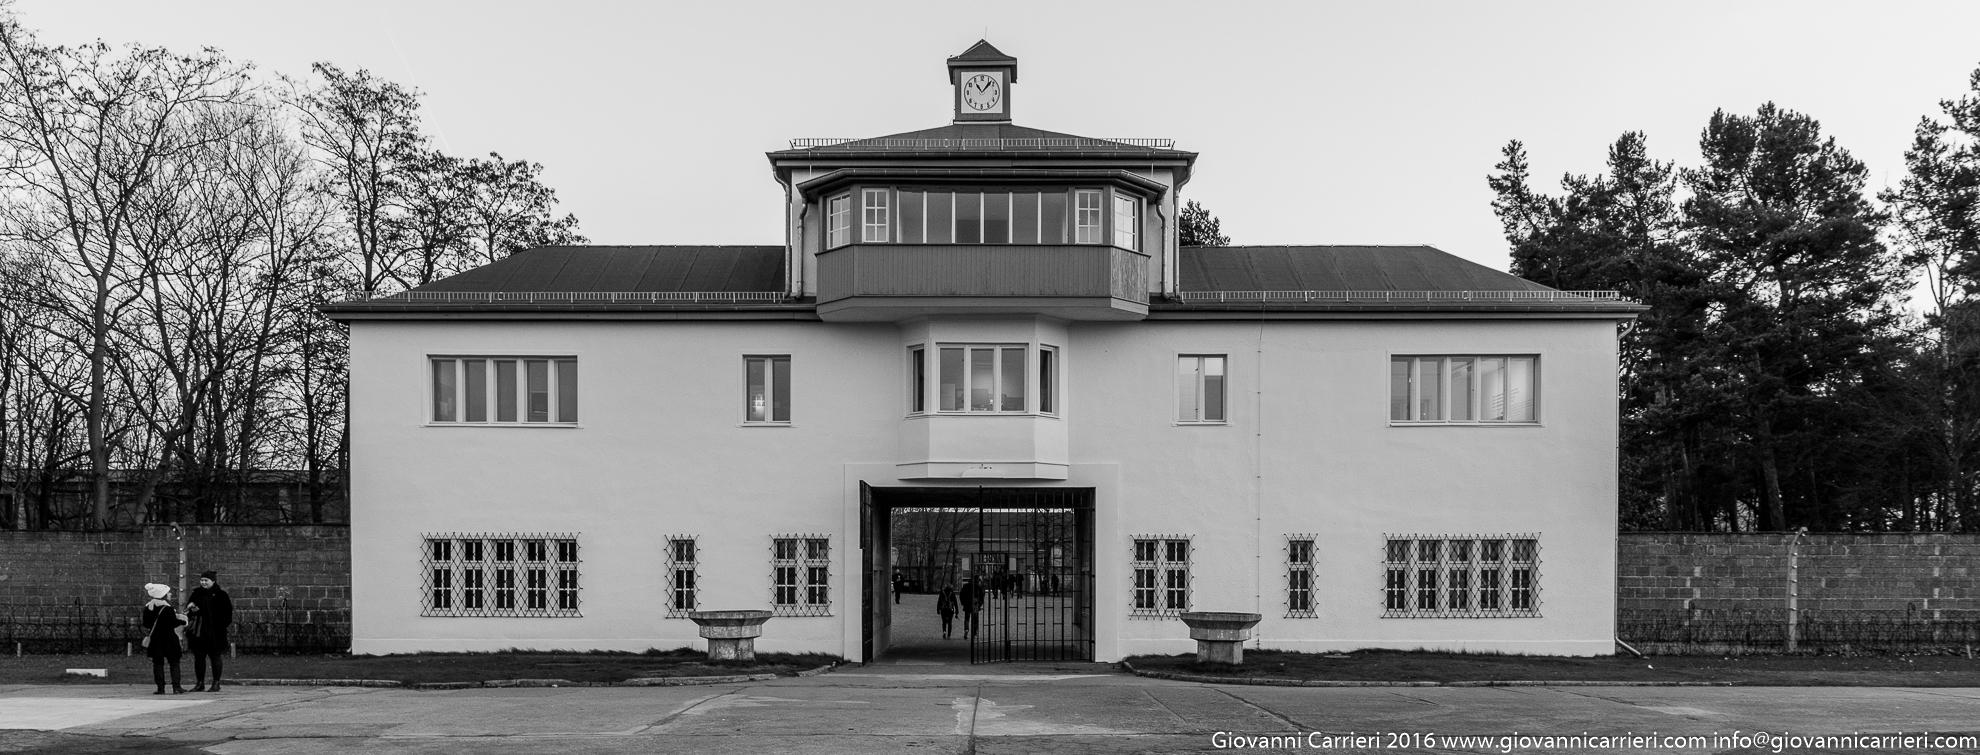 La appelplatz di Sachsenausen